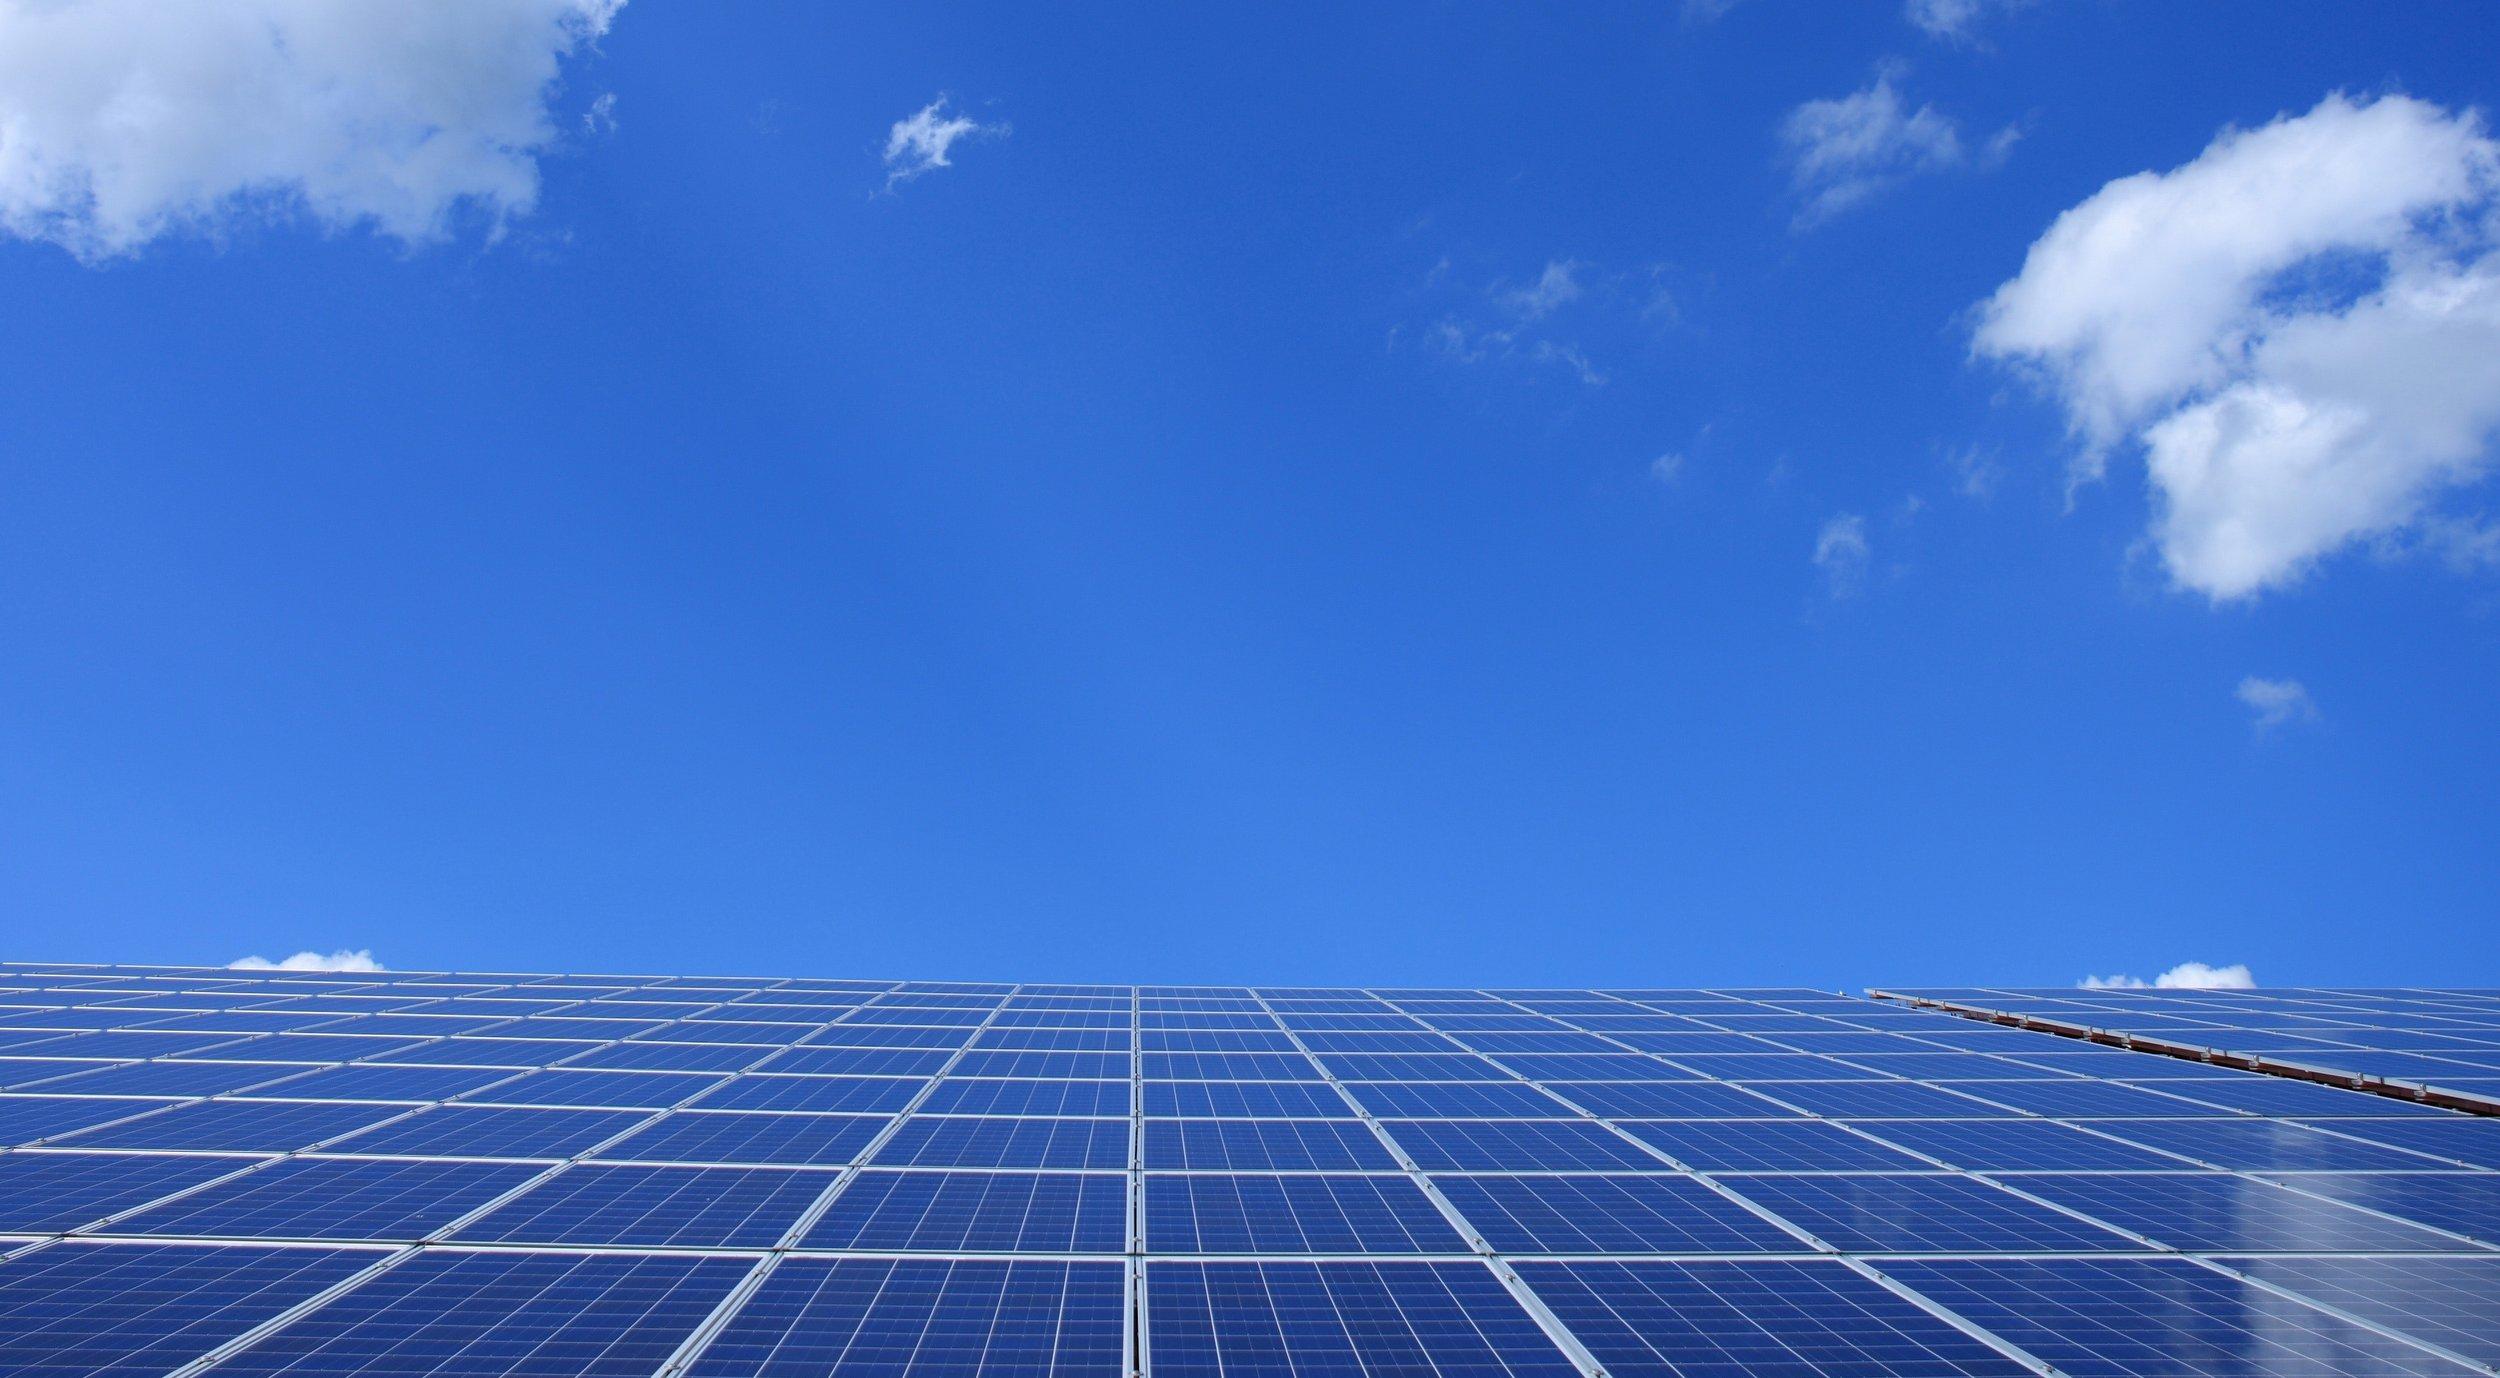 300-sl-alternative-energy-blue-sky-371900.jpg